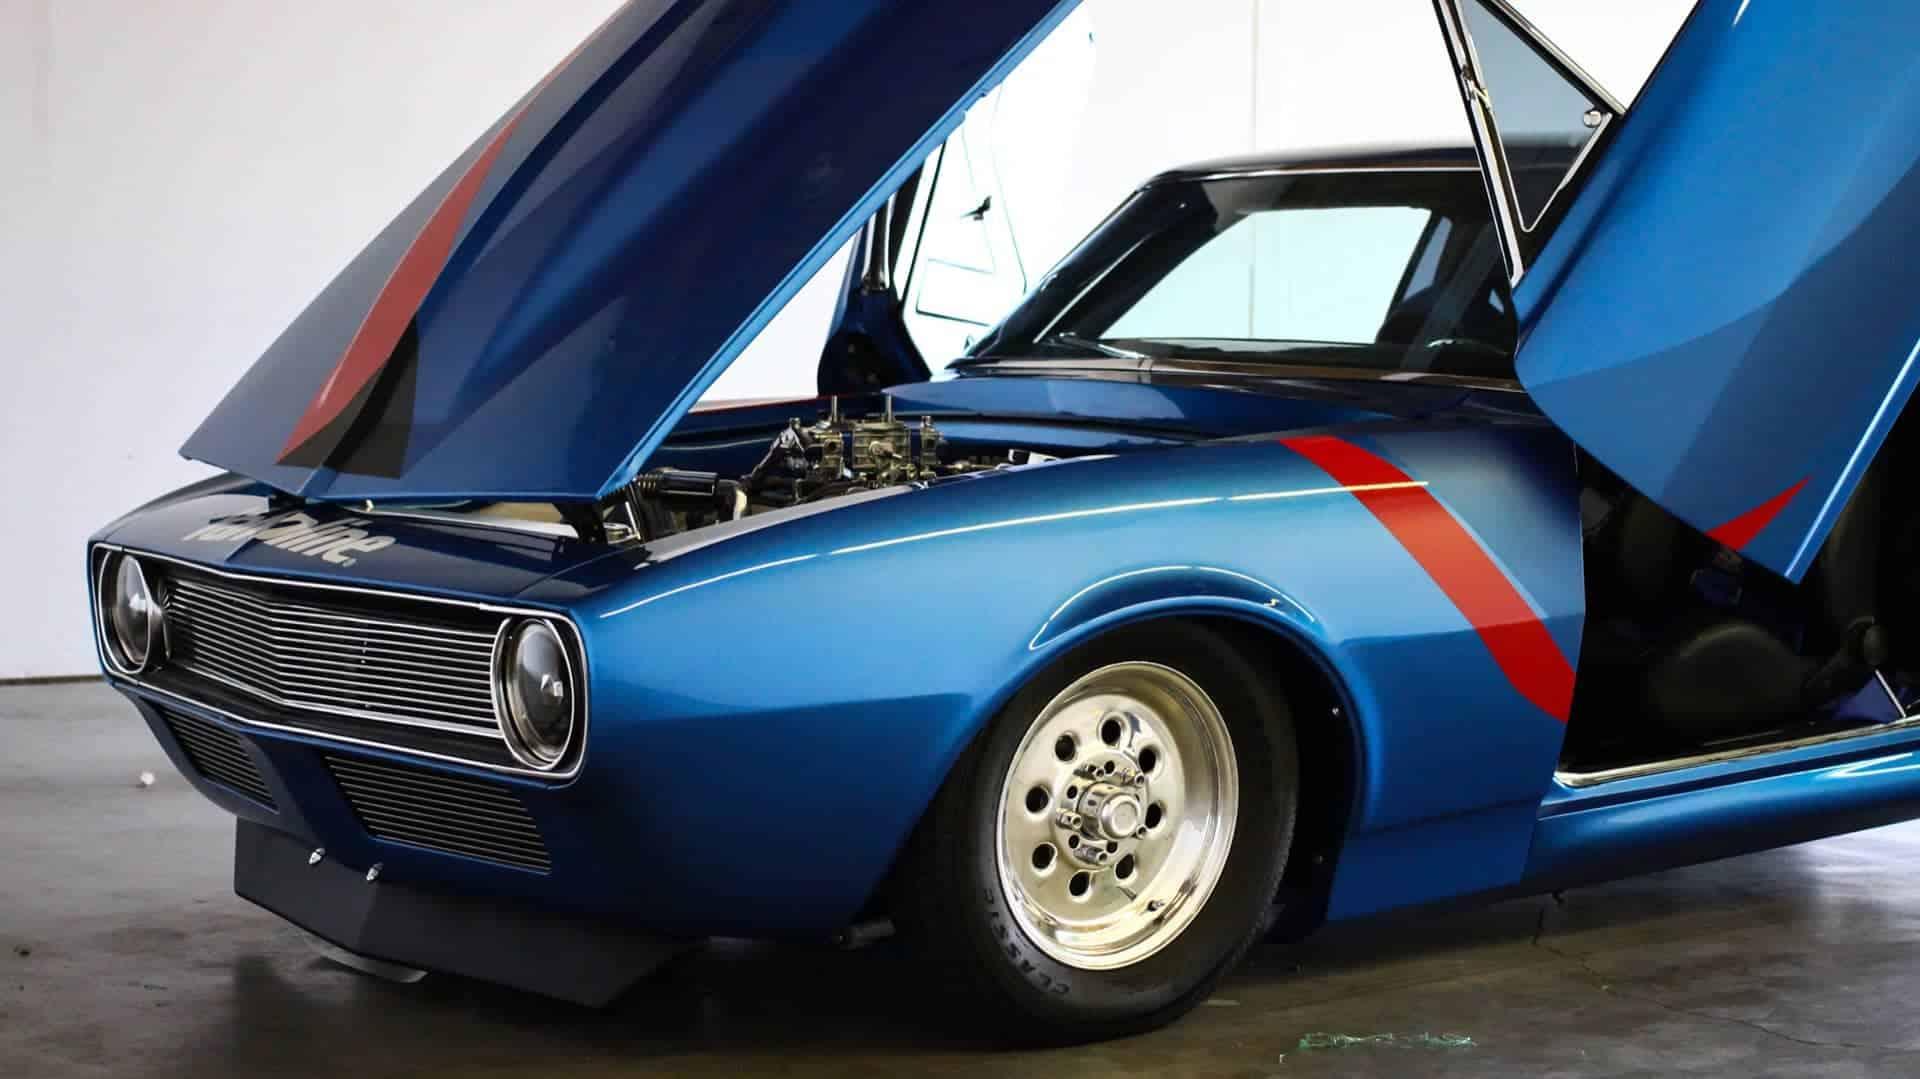 Valvoline Graphics for this classic Camaro for Old Iron Classics